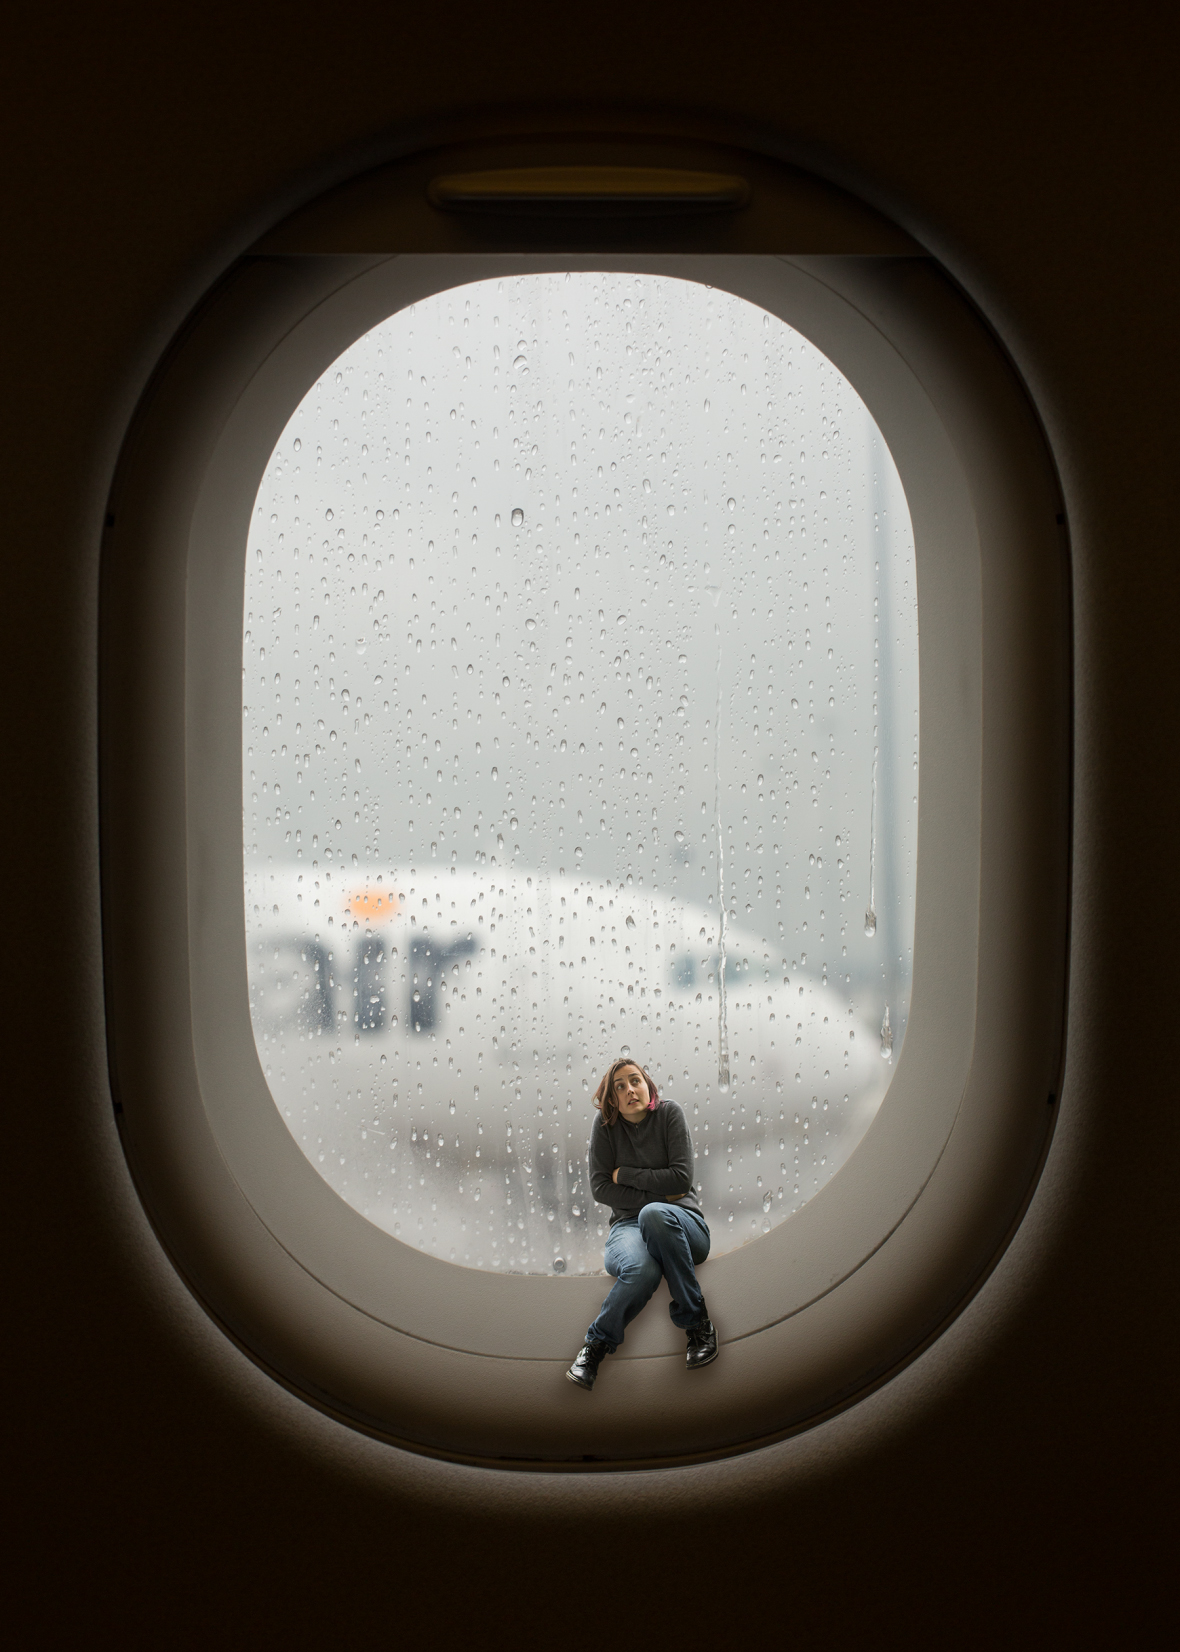 085-photo-manipulation-plane-window-rainy